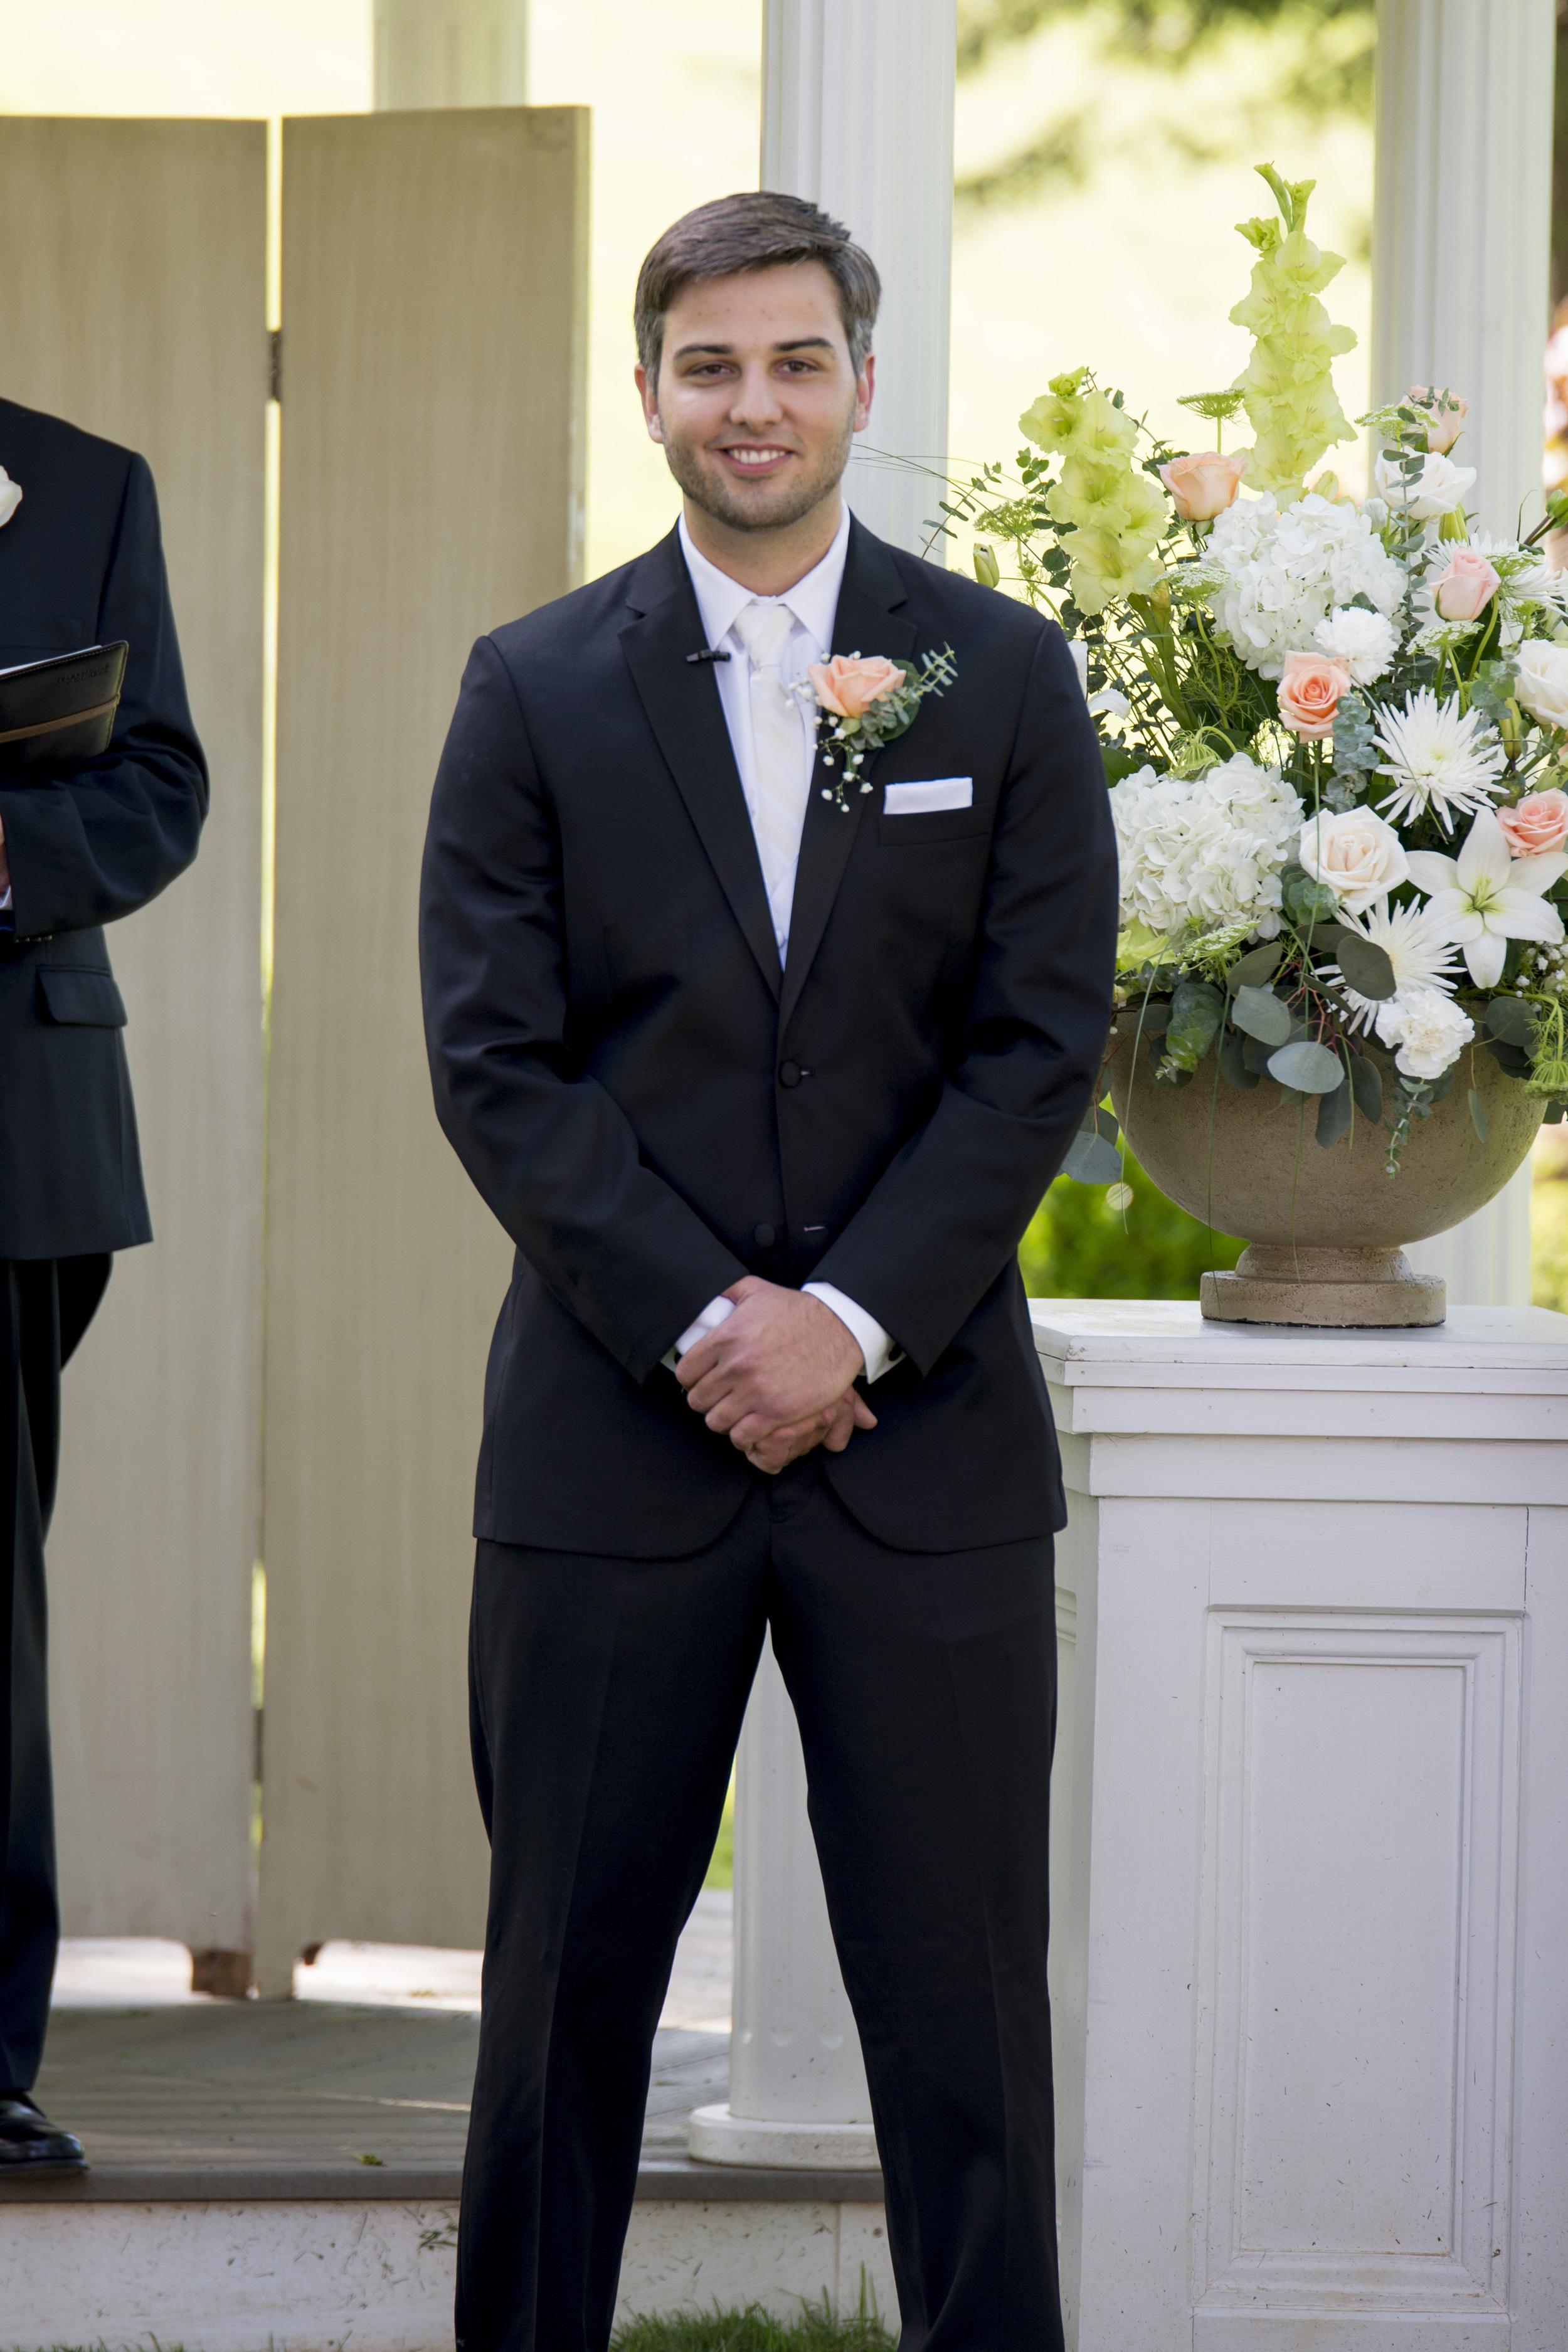 peach_plantation_spring_wedding_lynchburg_va022.jpg